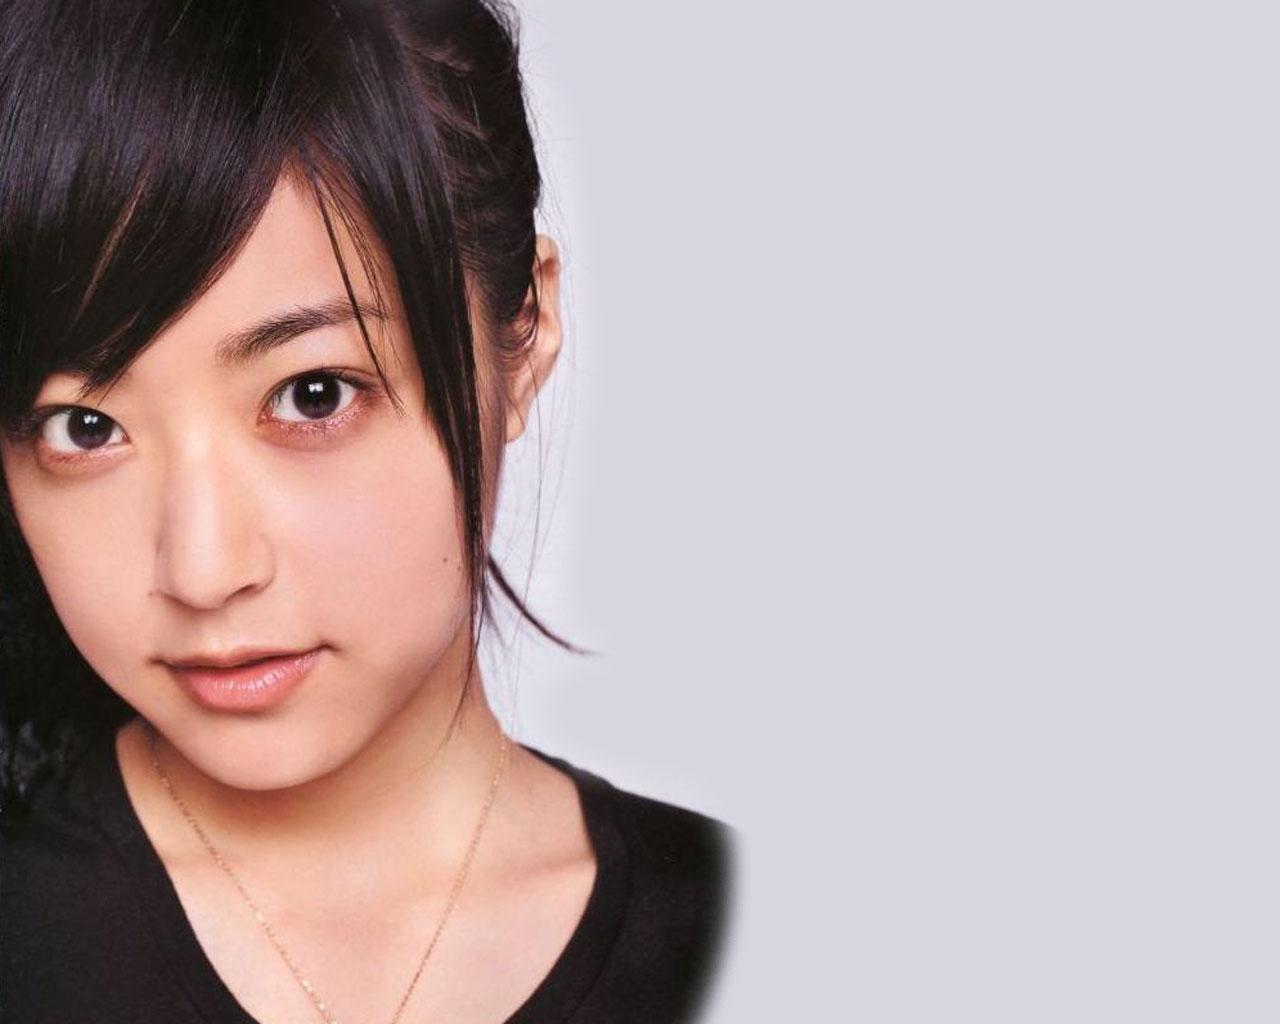 mao inoue 井上 真央 inoue mao born january 9 1987 is a japanese ...